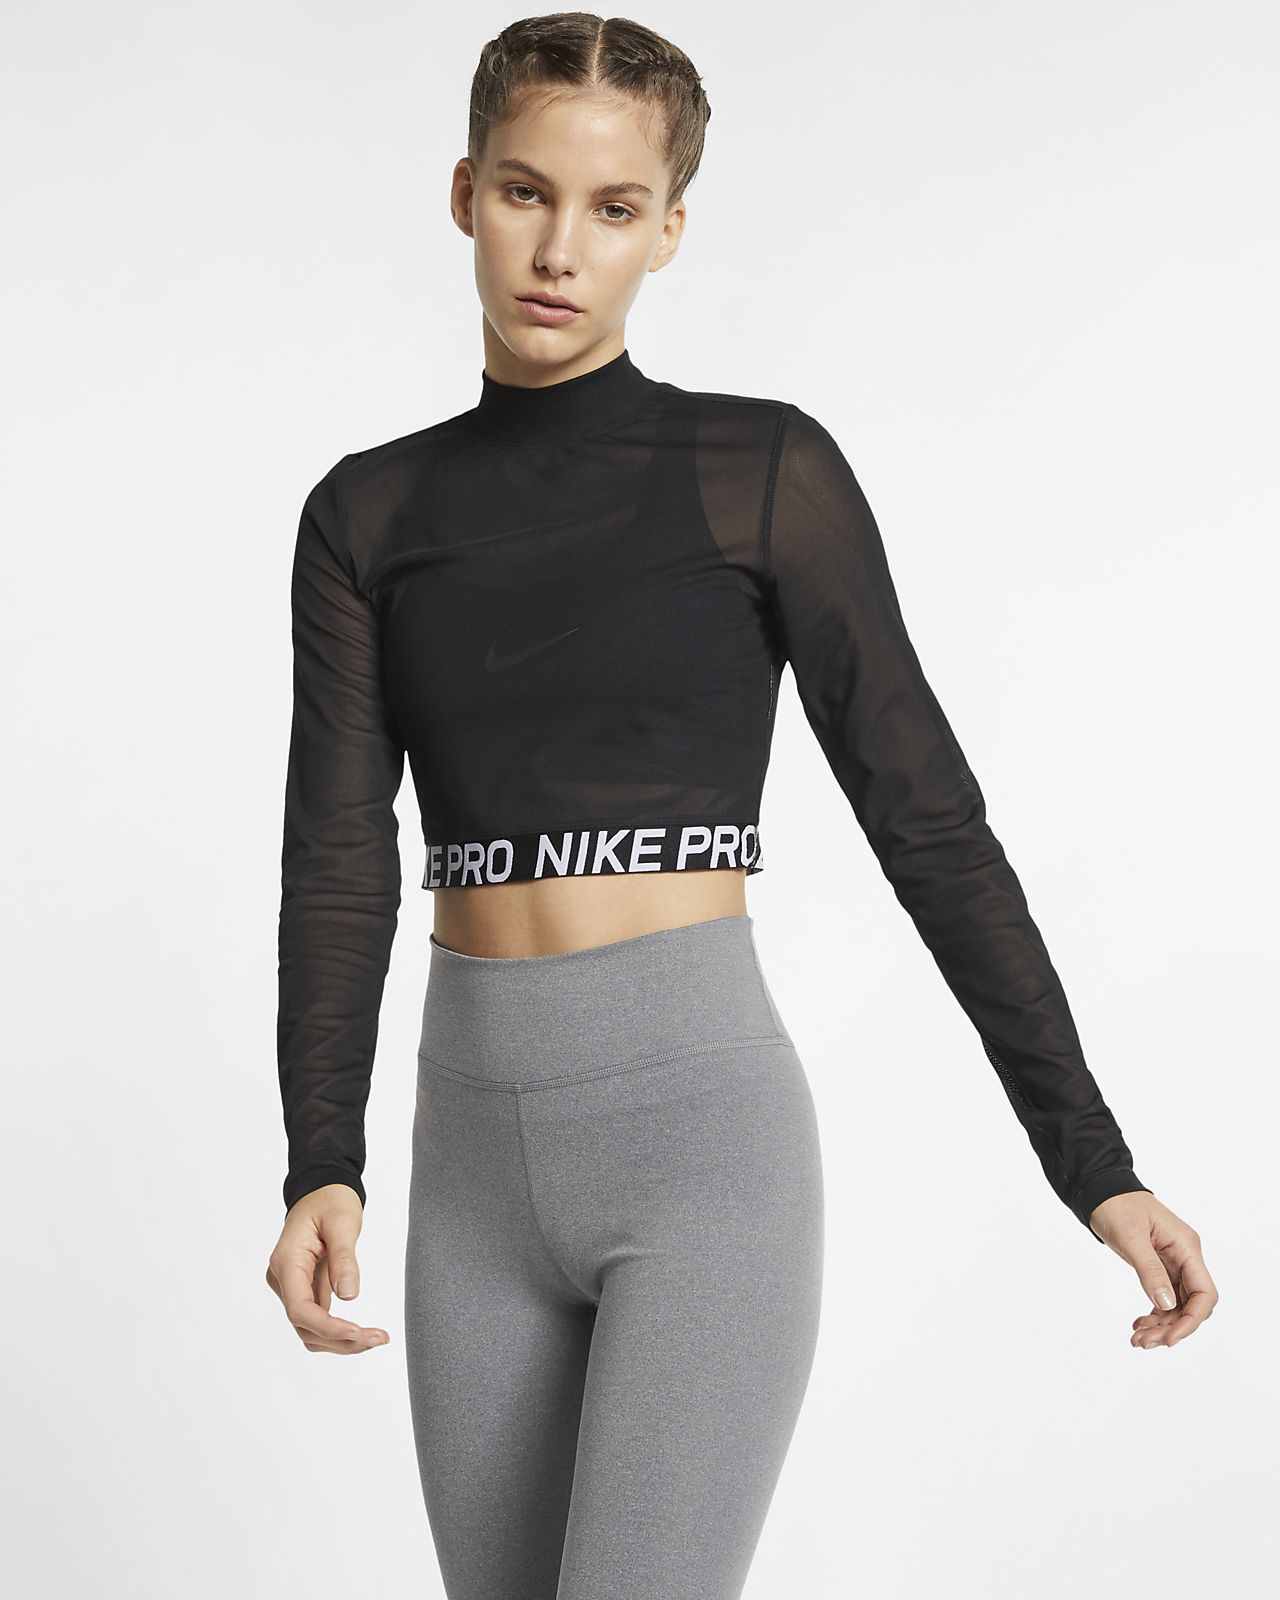 official photos 59b5e 60a73 Langærmet Nike Pro-top til kvinder